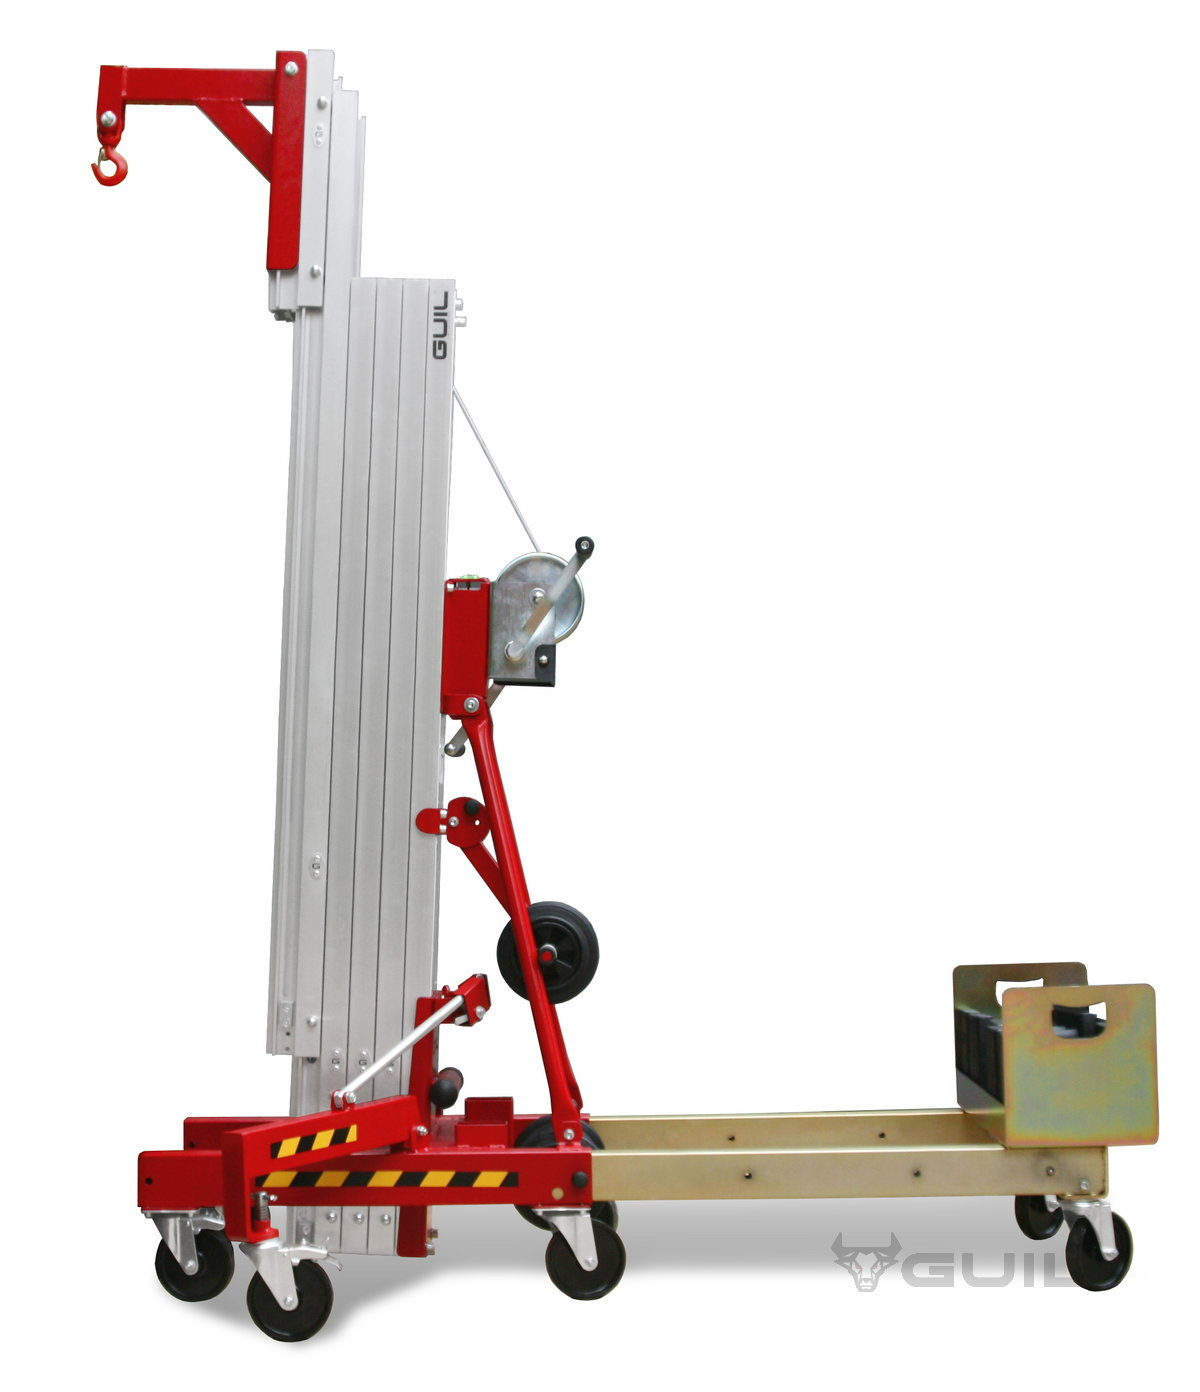 Kanaallift 6,5 m 400 kg (dutch) (9)